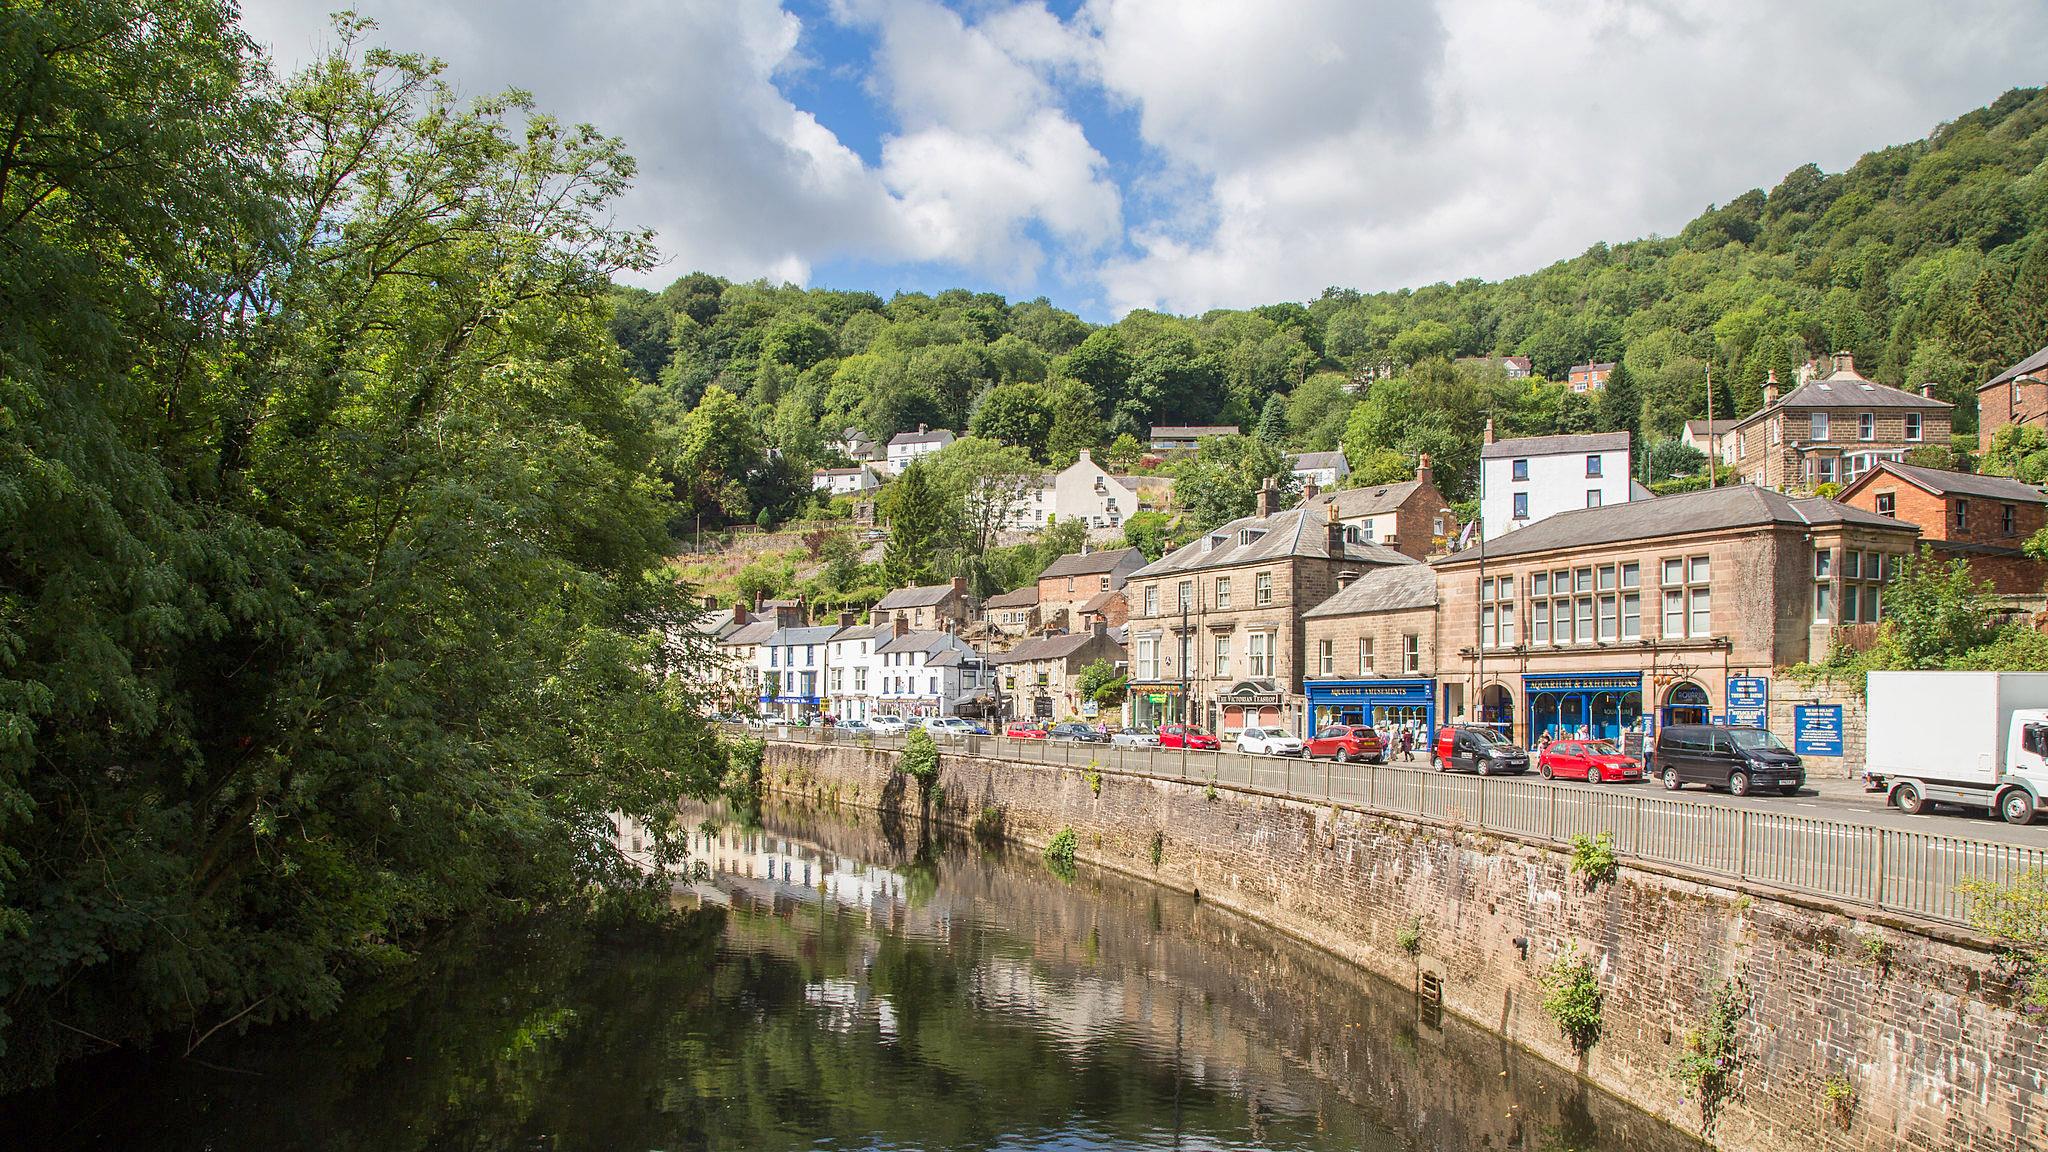 The River Derwent at Matlock Bath by John Hammond.jpg